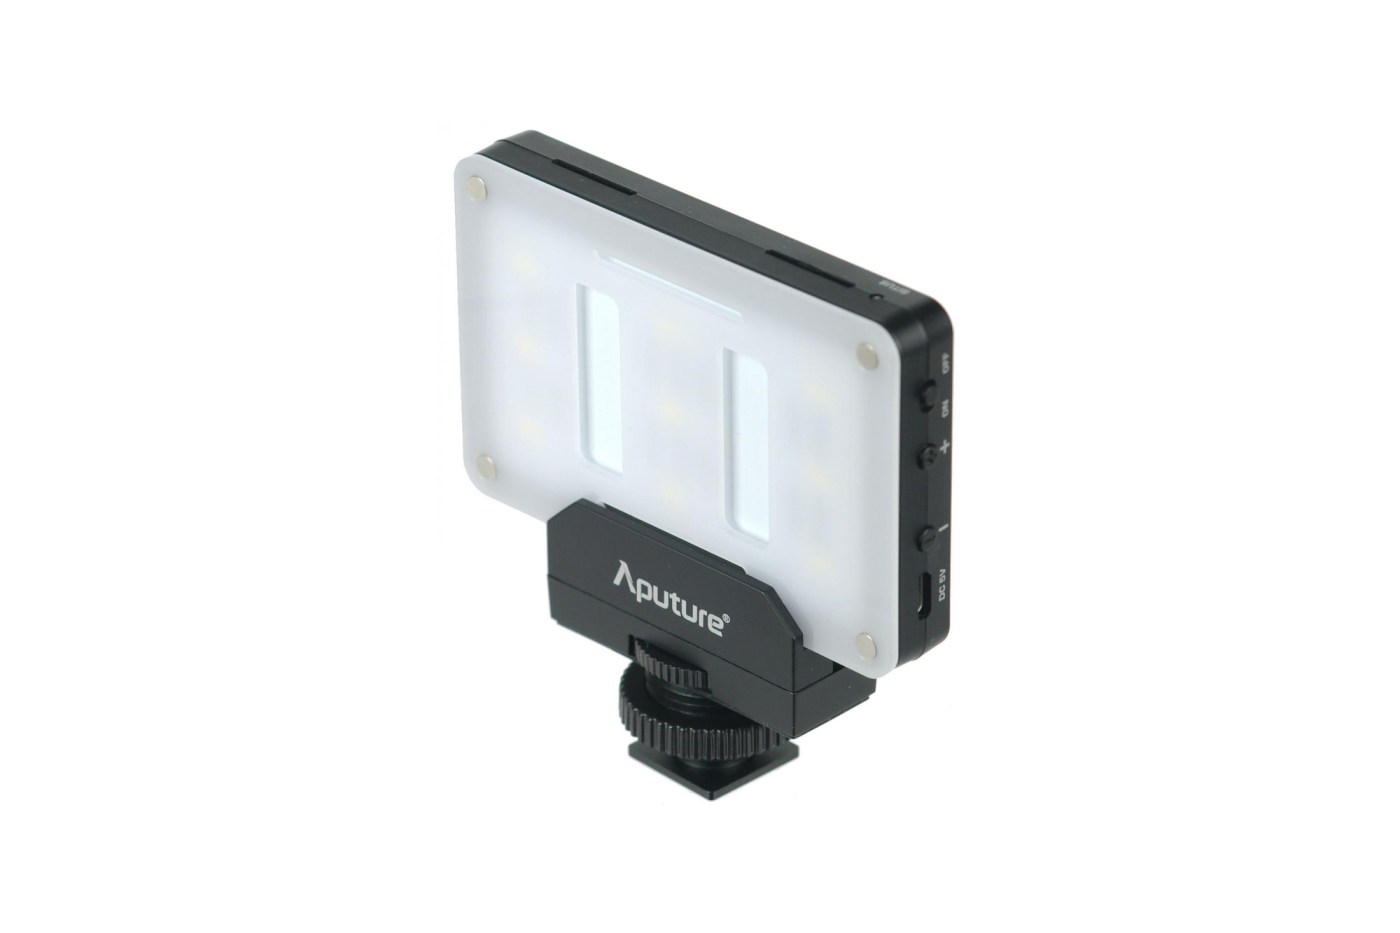 Aputure Amaran AL-M9 light